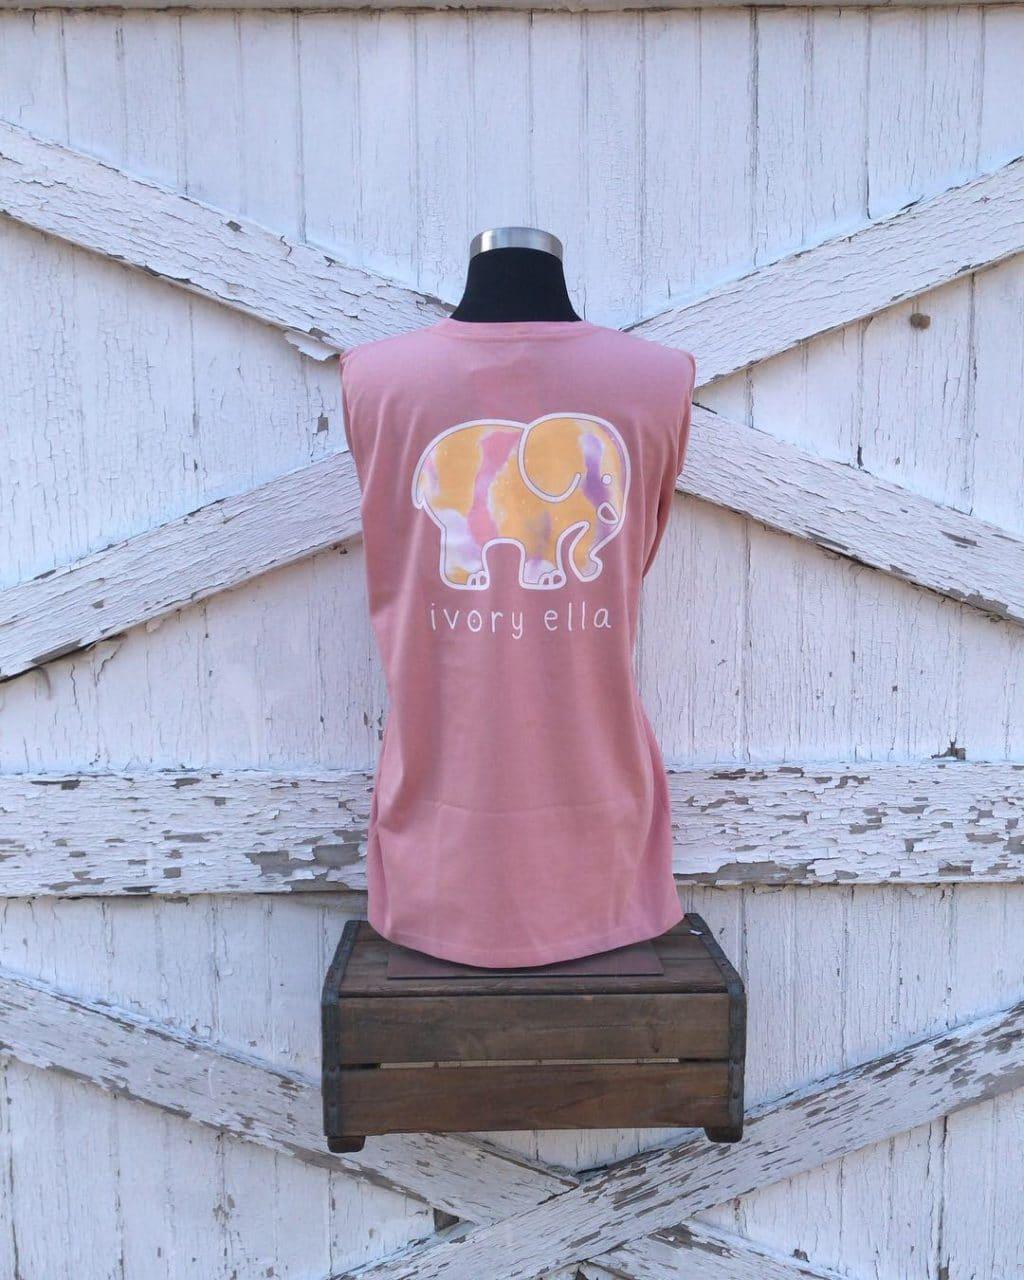 30e7c4ea3 Ivory Ella Womens Long Sleeve T-Shirt – Rose Quartz – Winterwood ...